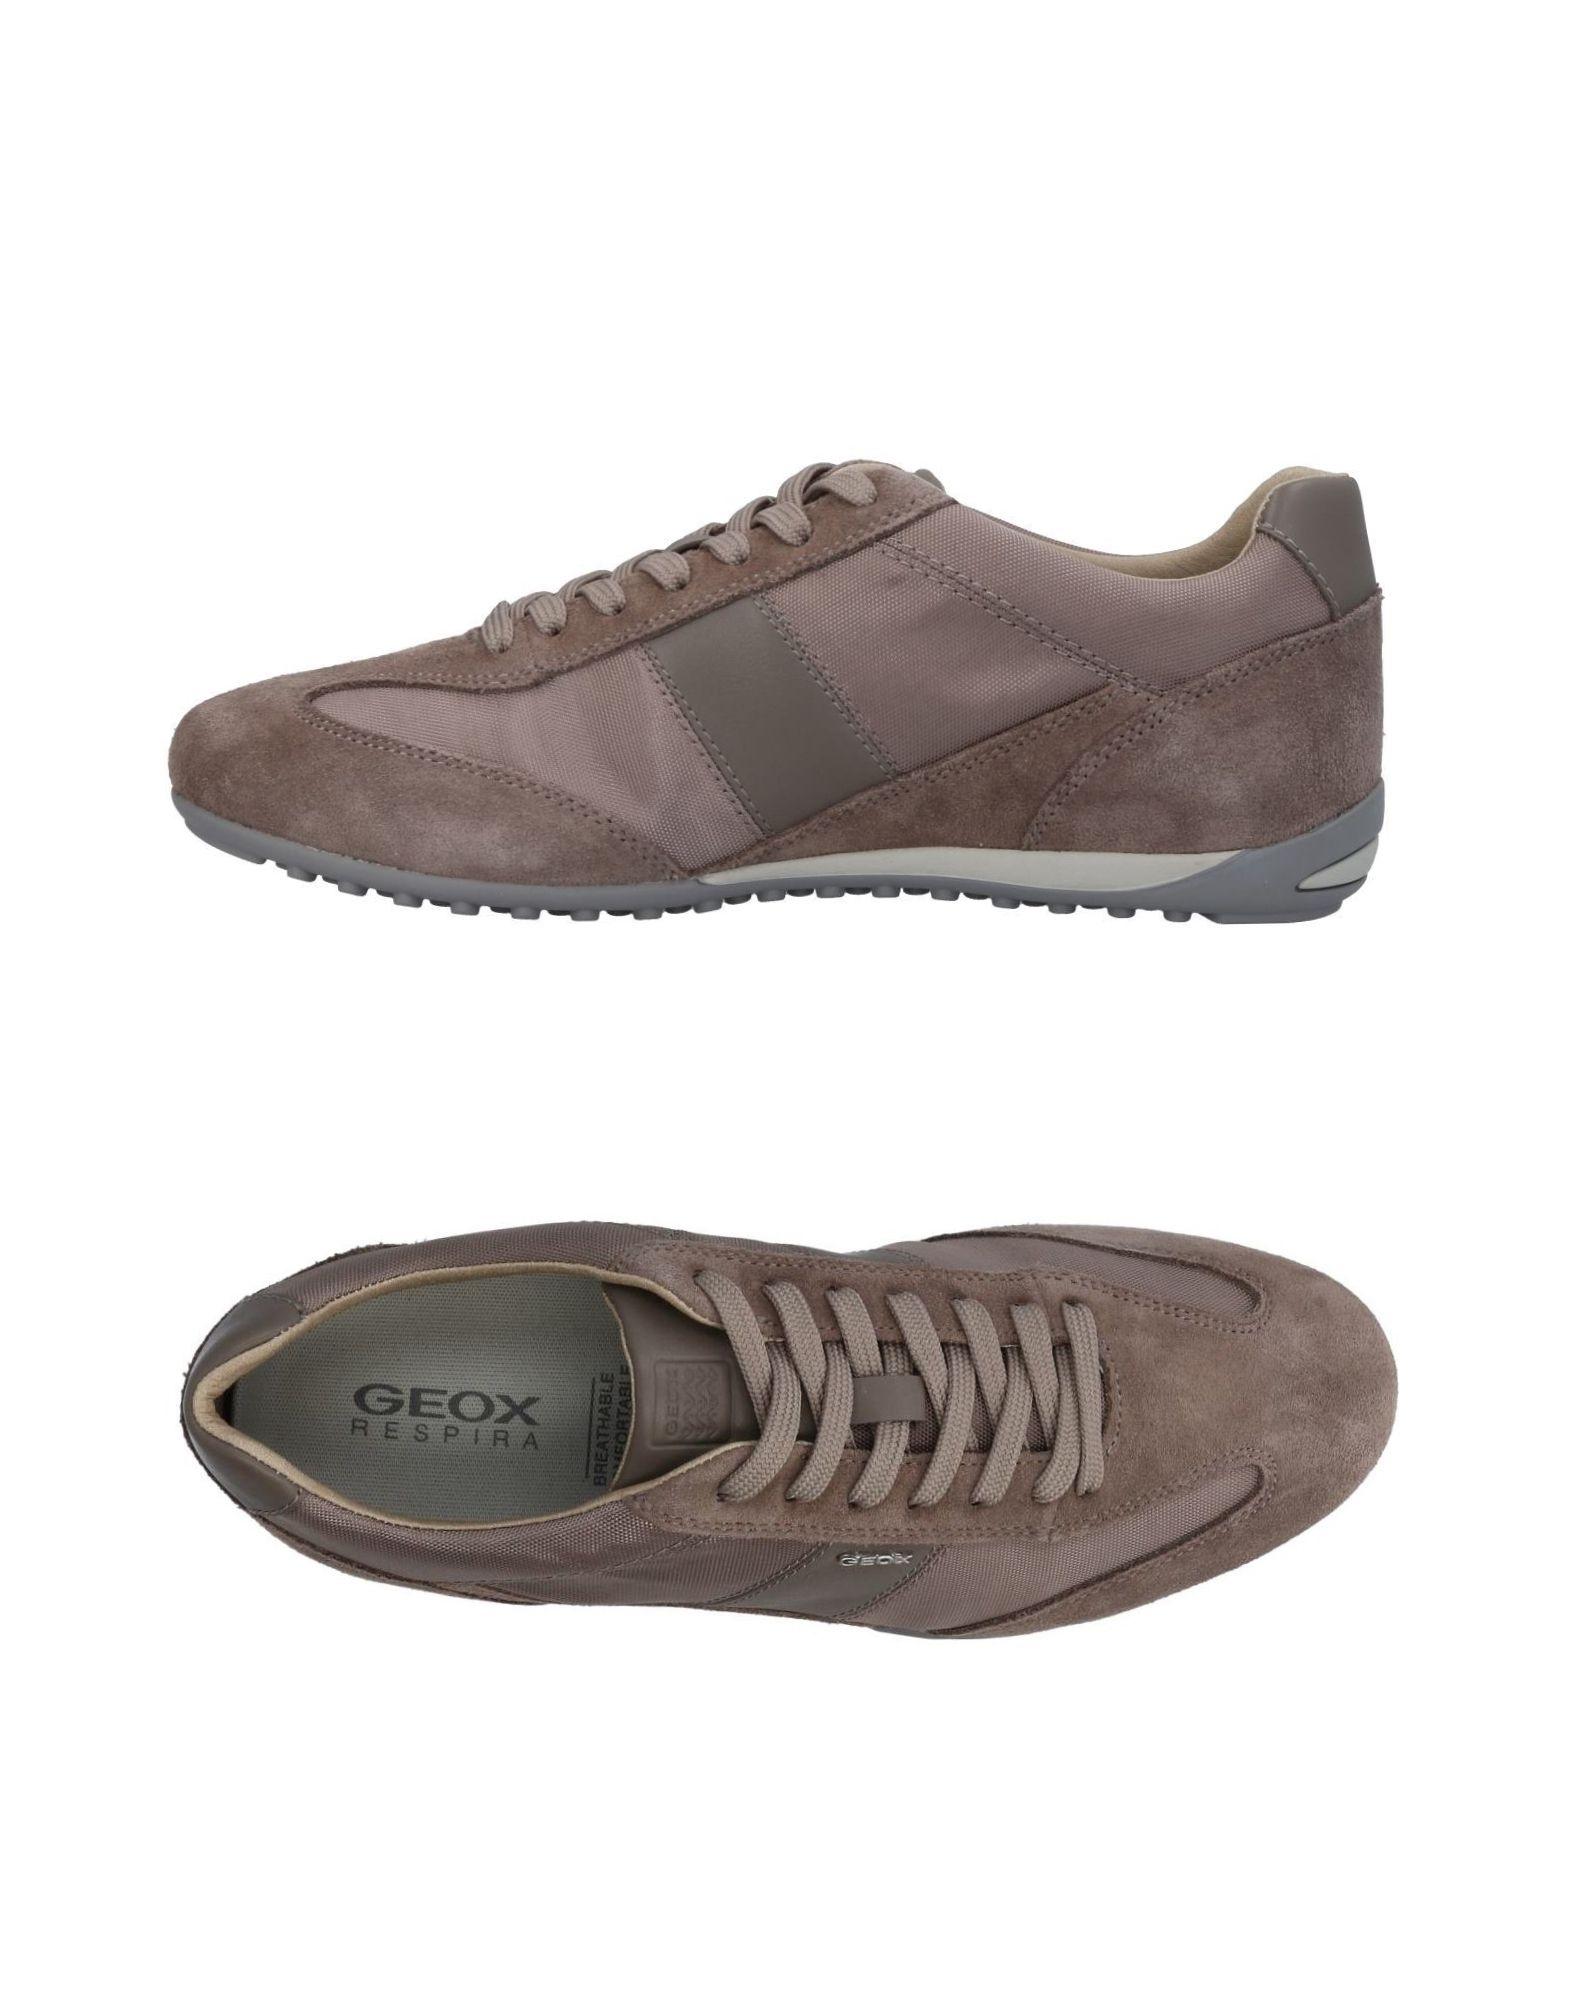 Sneakers Geox Homme - Sneakers Geox  Kaki Dédouanement saisonnier